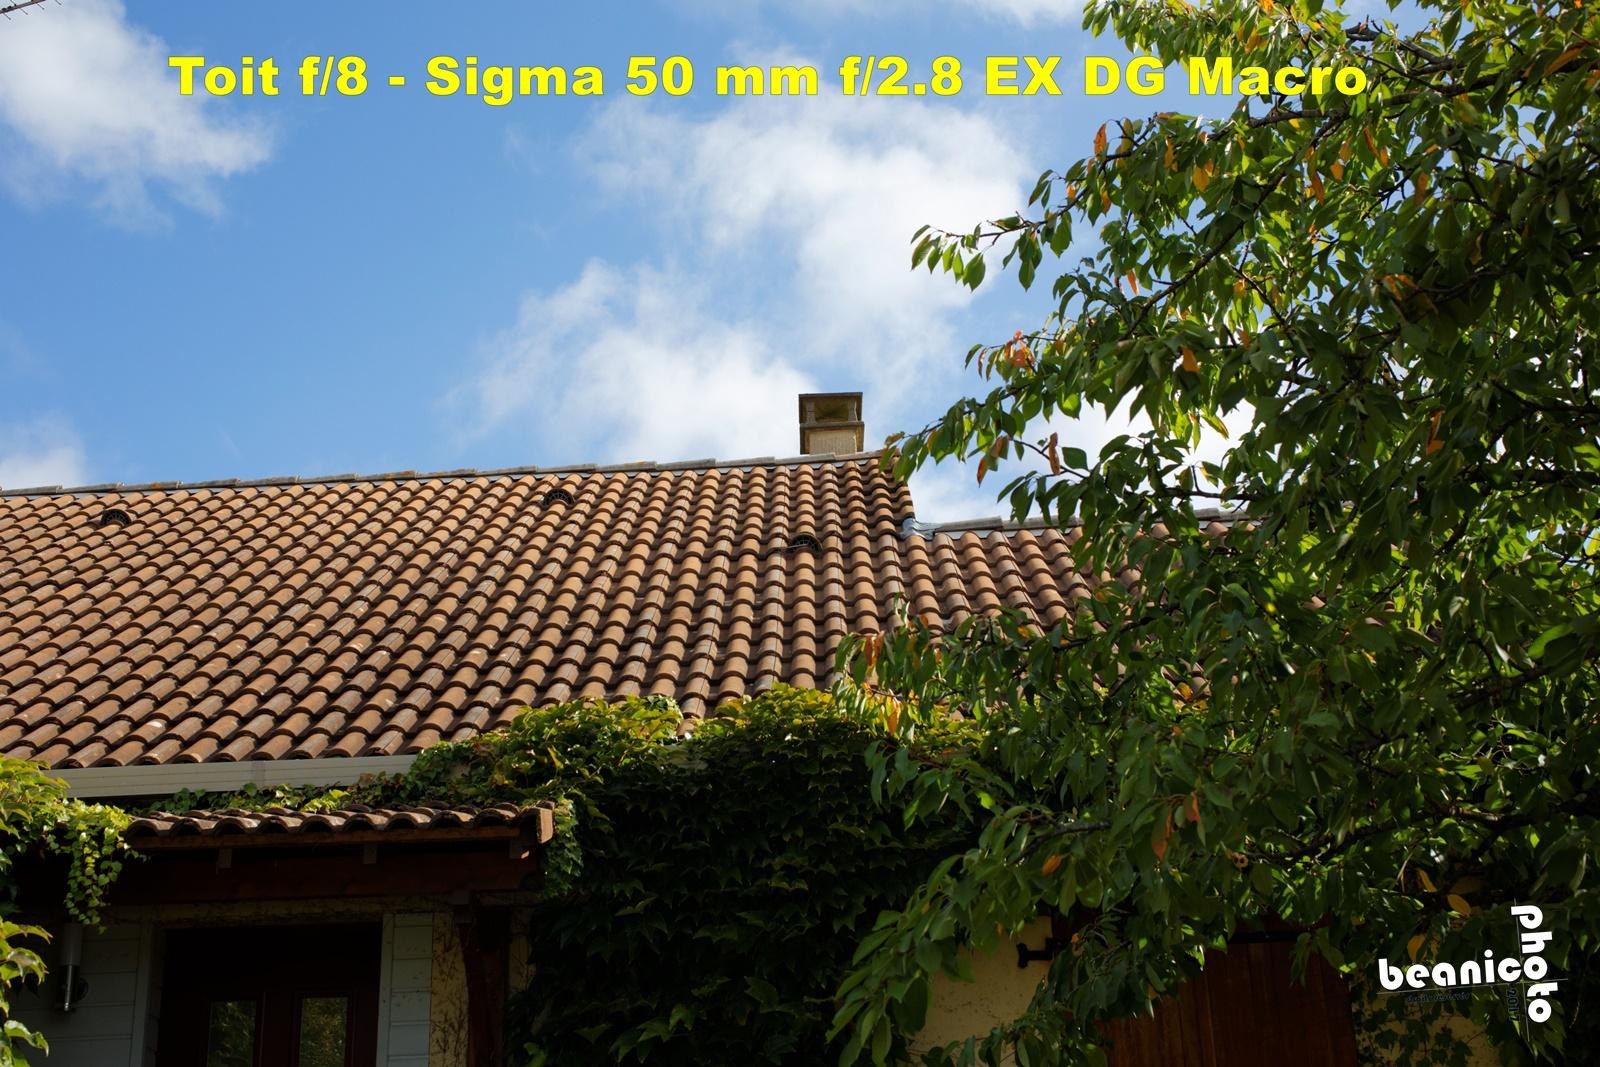 Canon 5DIII + Sigma 50 mm f/2.8 EX DG Macro - f/8 1/750 ISO400 - beanico-photo